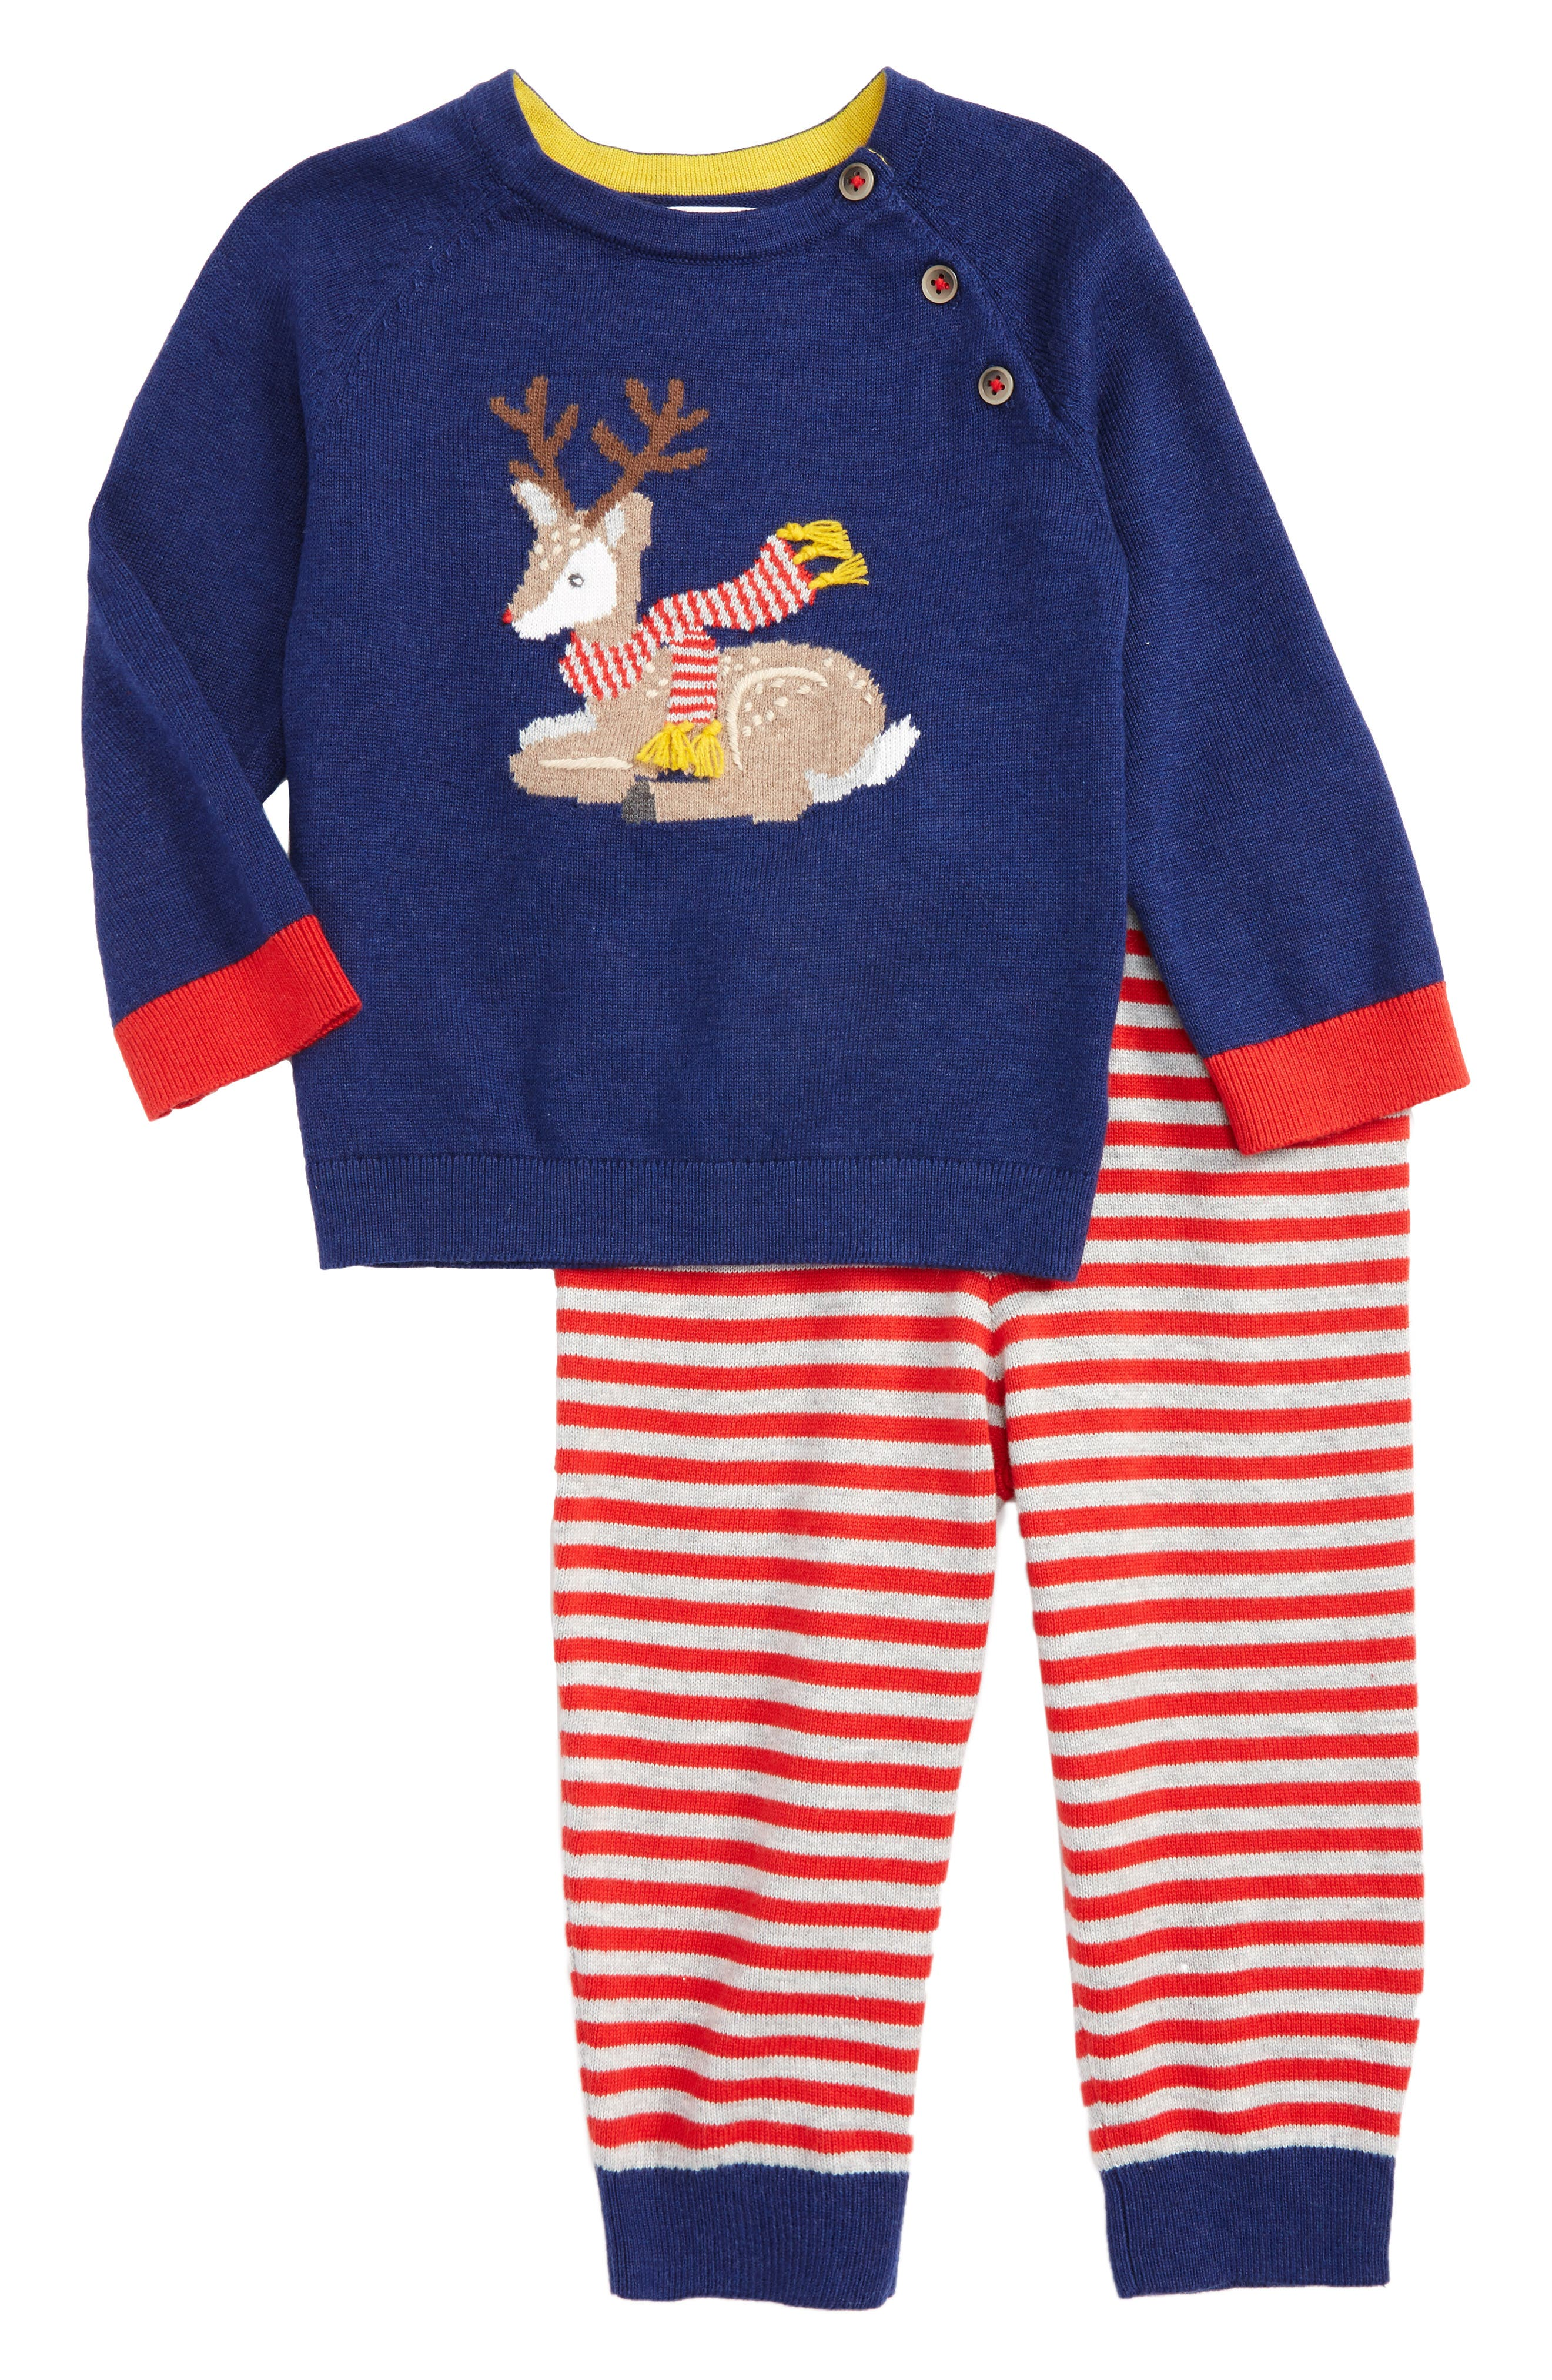 Fun Knit Sweater & Pants Set,                         Main,                         color, Beacon Blue Deer